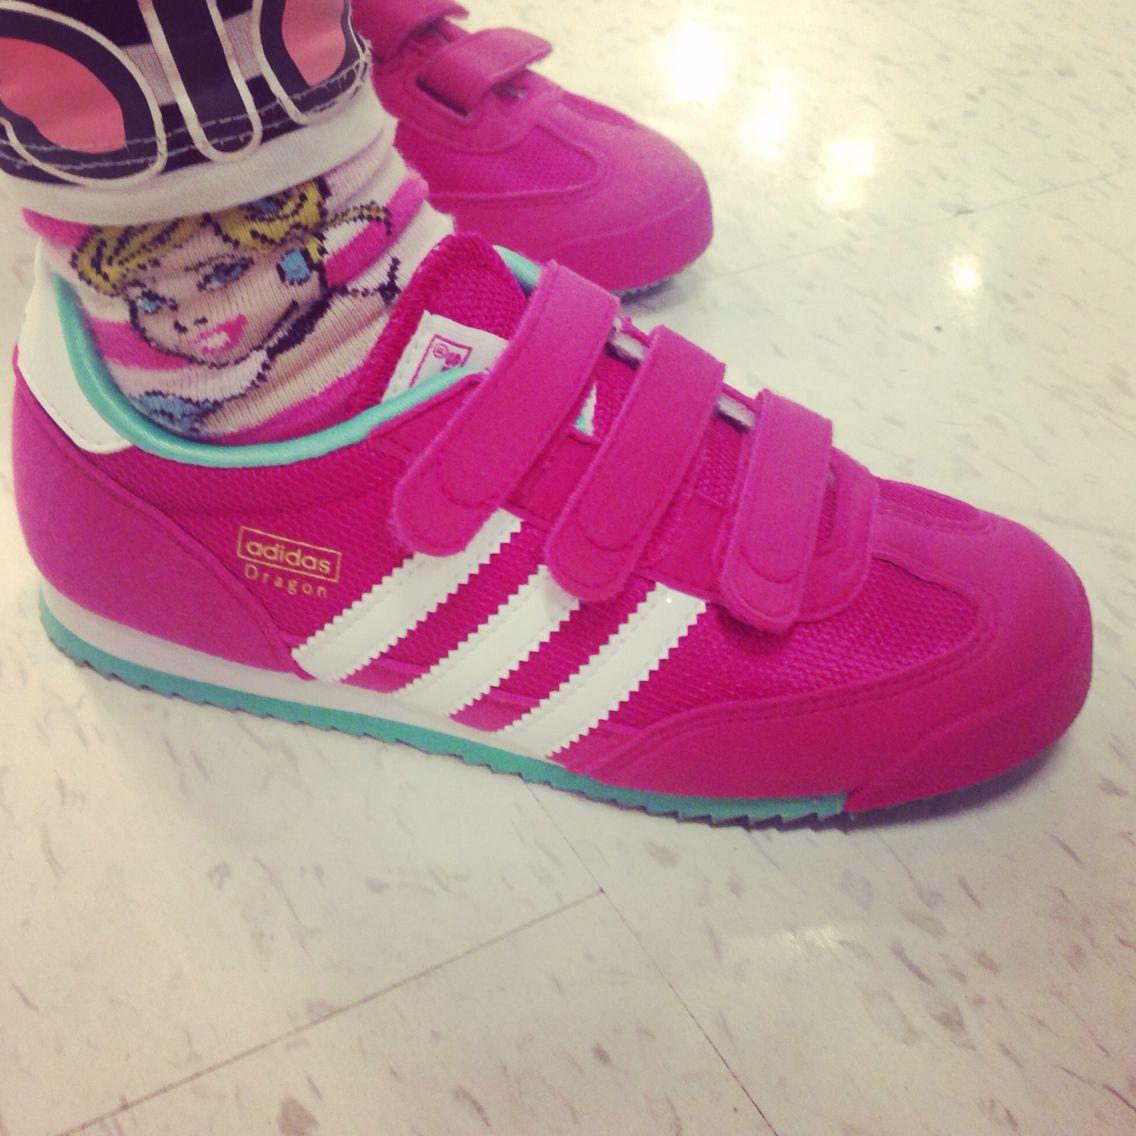 Adidas #Dragon #pink shoes   KIDS   Adidas, Sneakers, Adidas